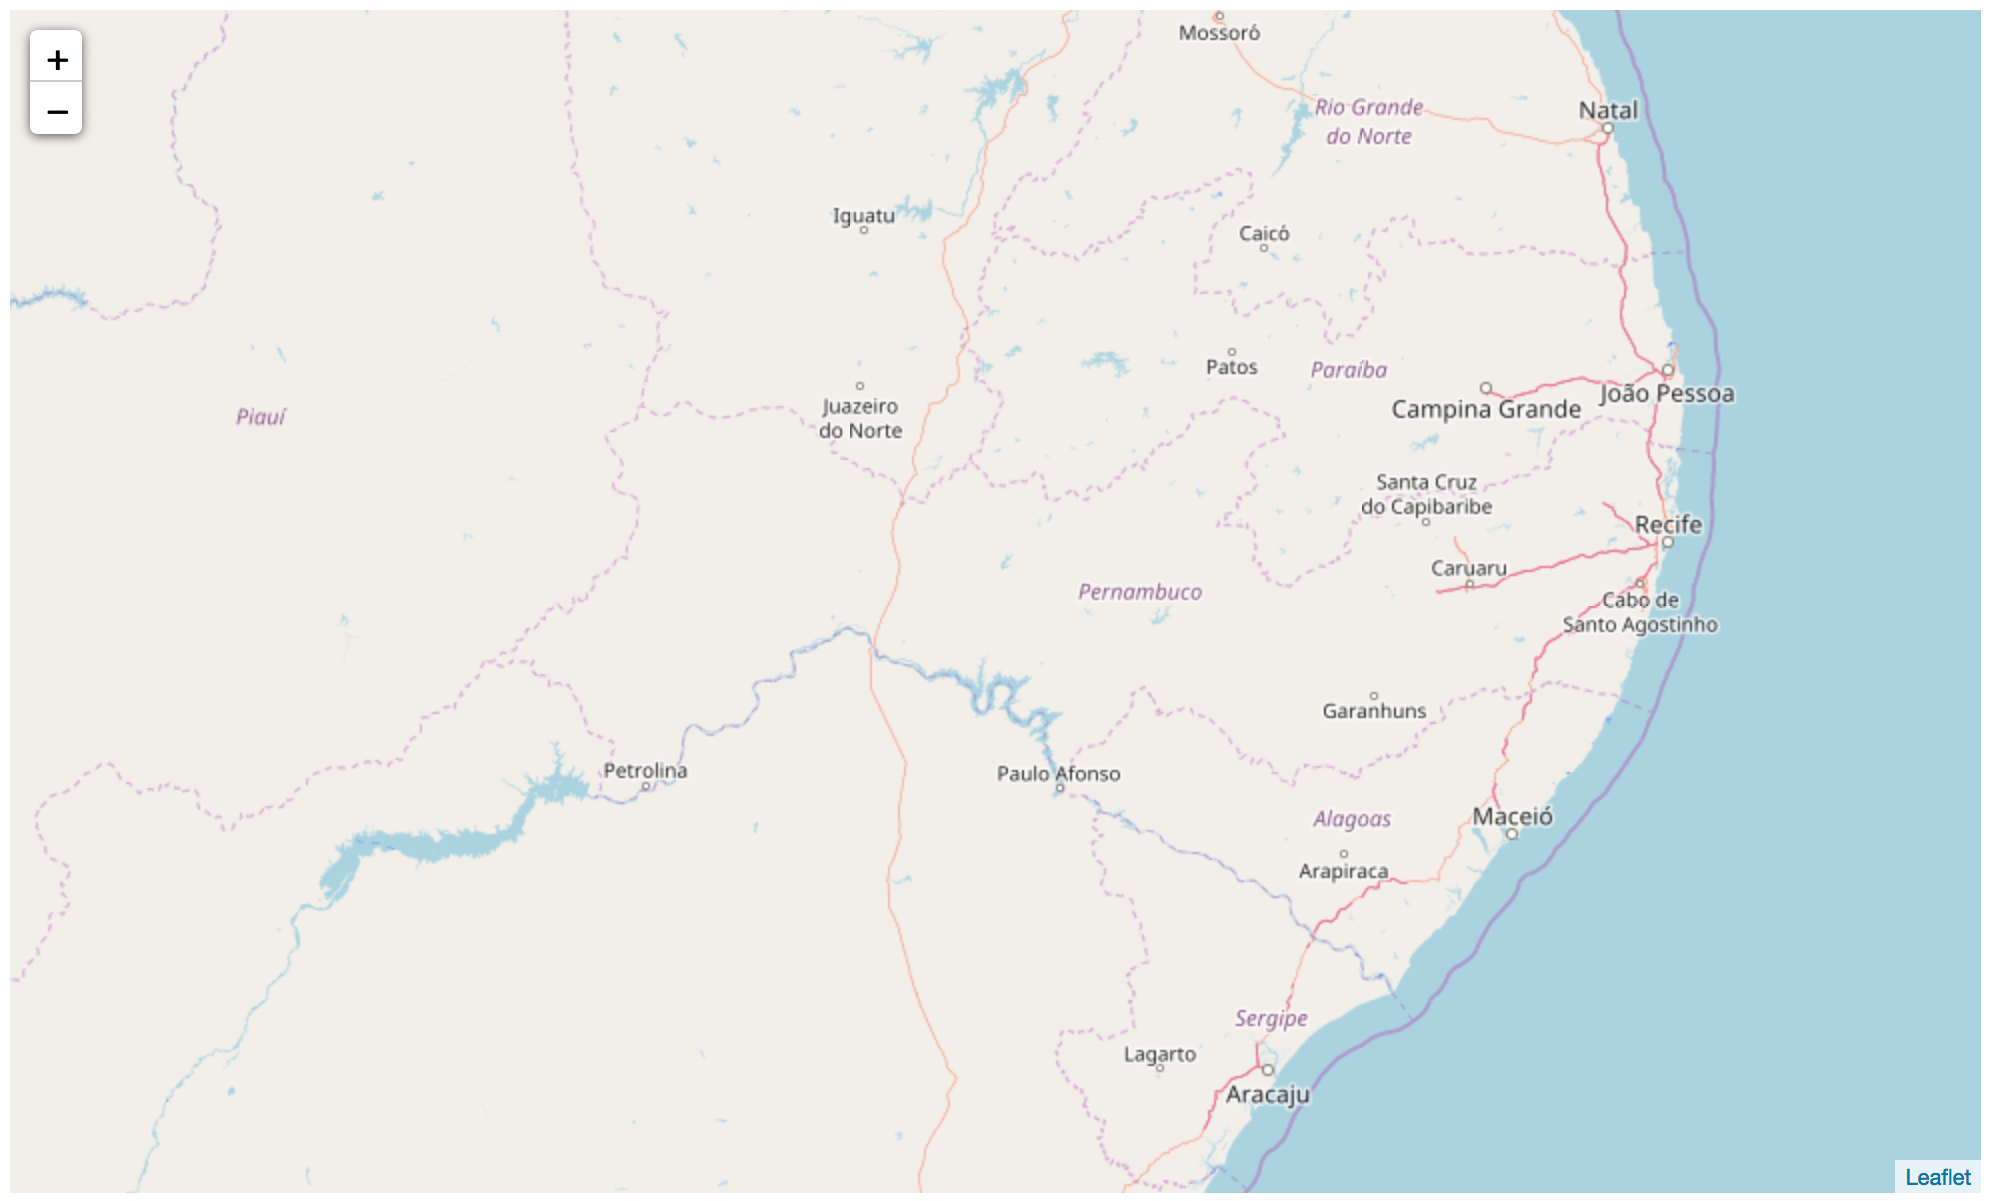 mapa de Pernambuco